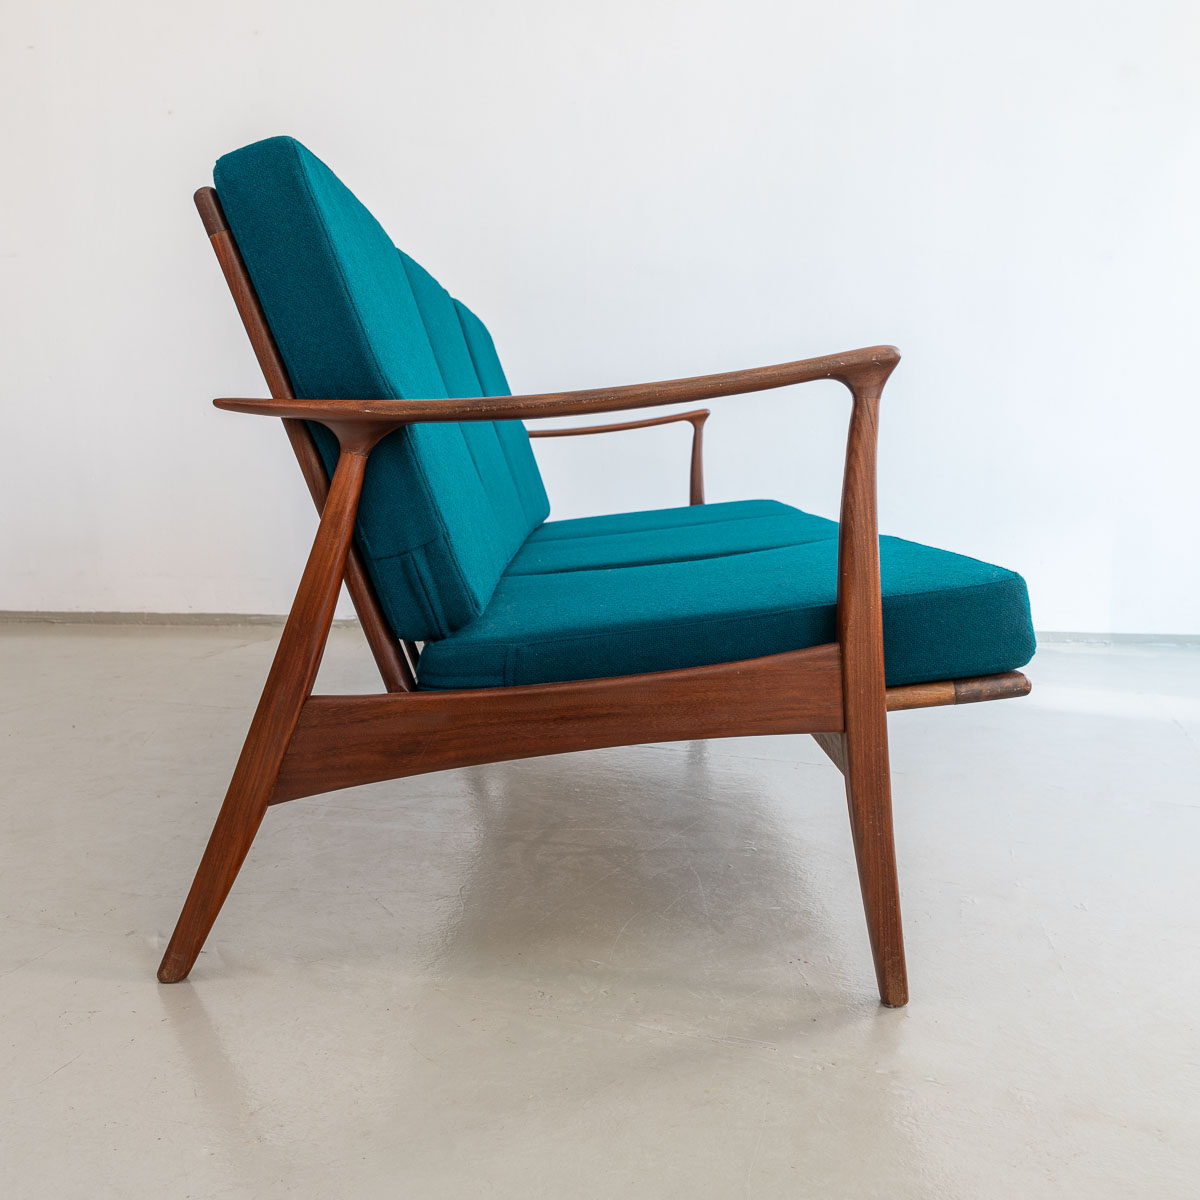 Midcentury modern Sofa in Teakholz